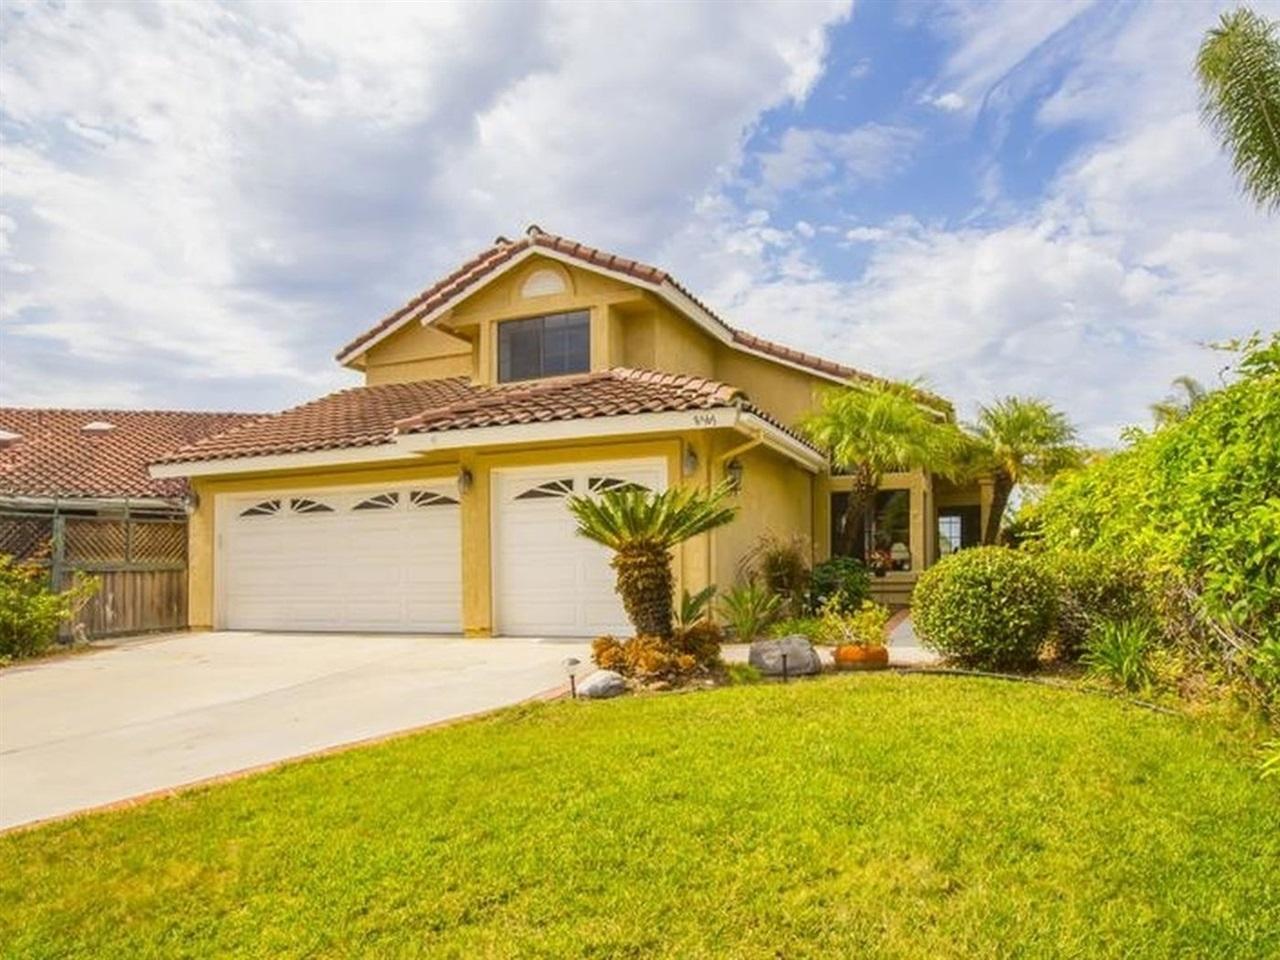 8565 Foxcroft, San Diego, CA